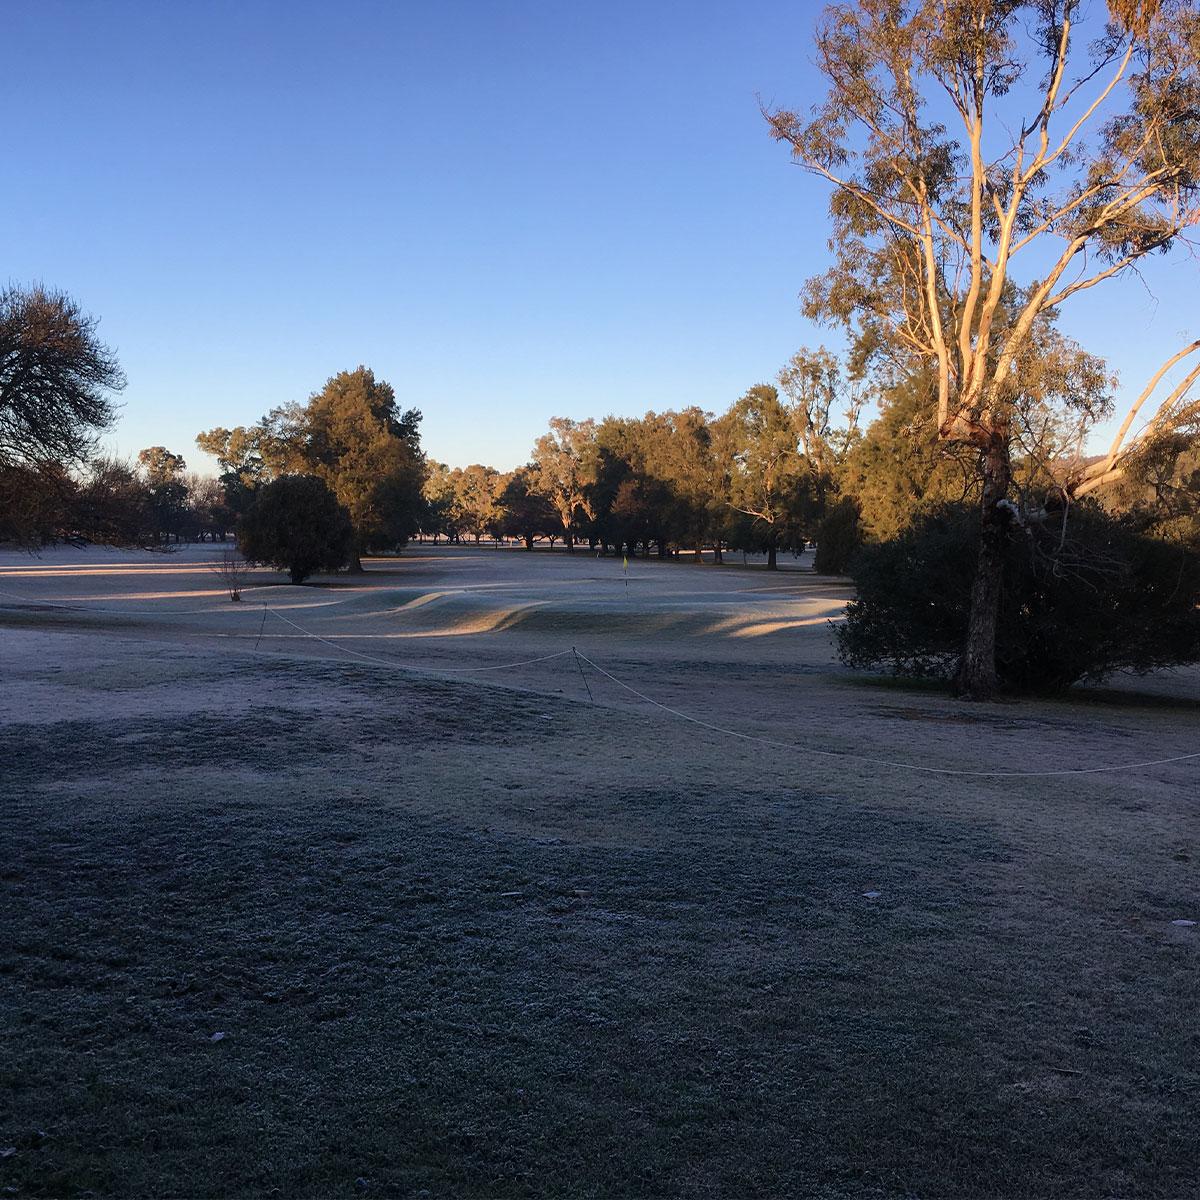 Wellington-Golf-Club-Frosty-morning-looking-down-2nd-&-3rd-Faiways-1200x1200